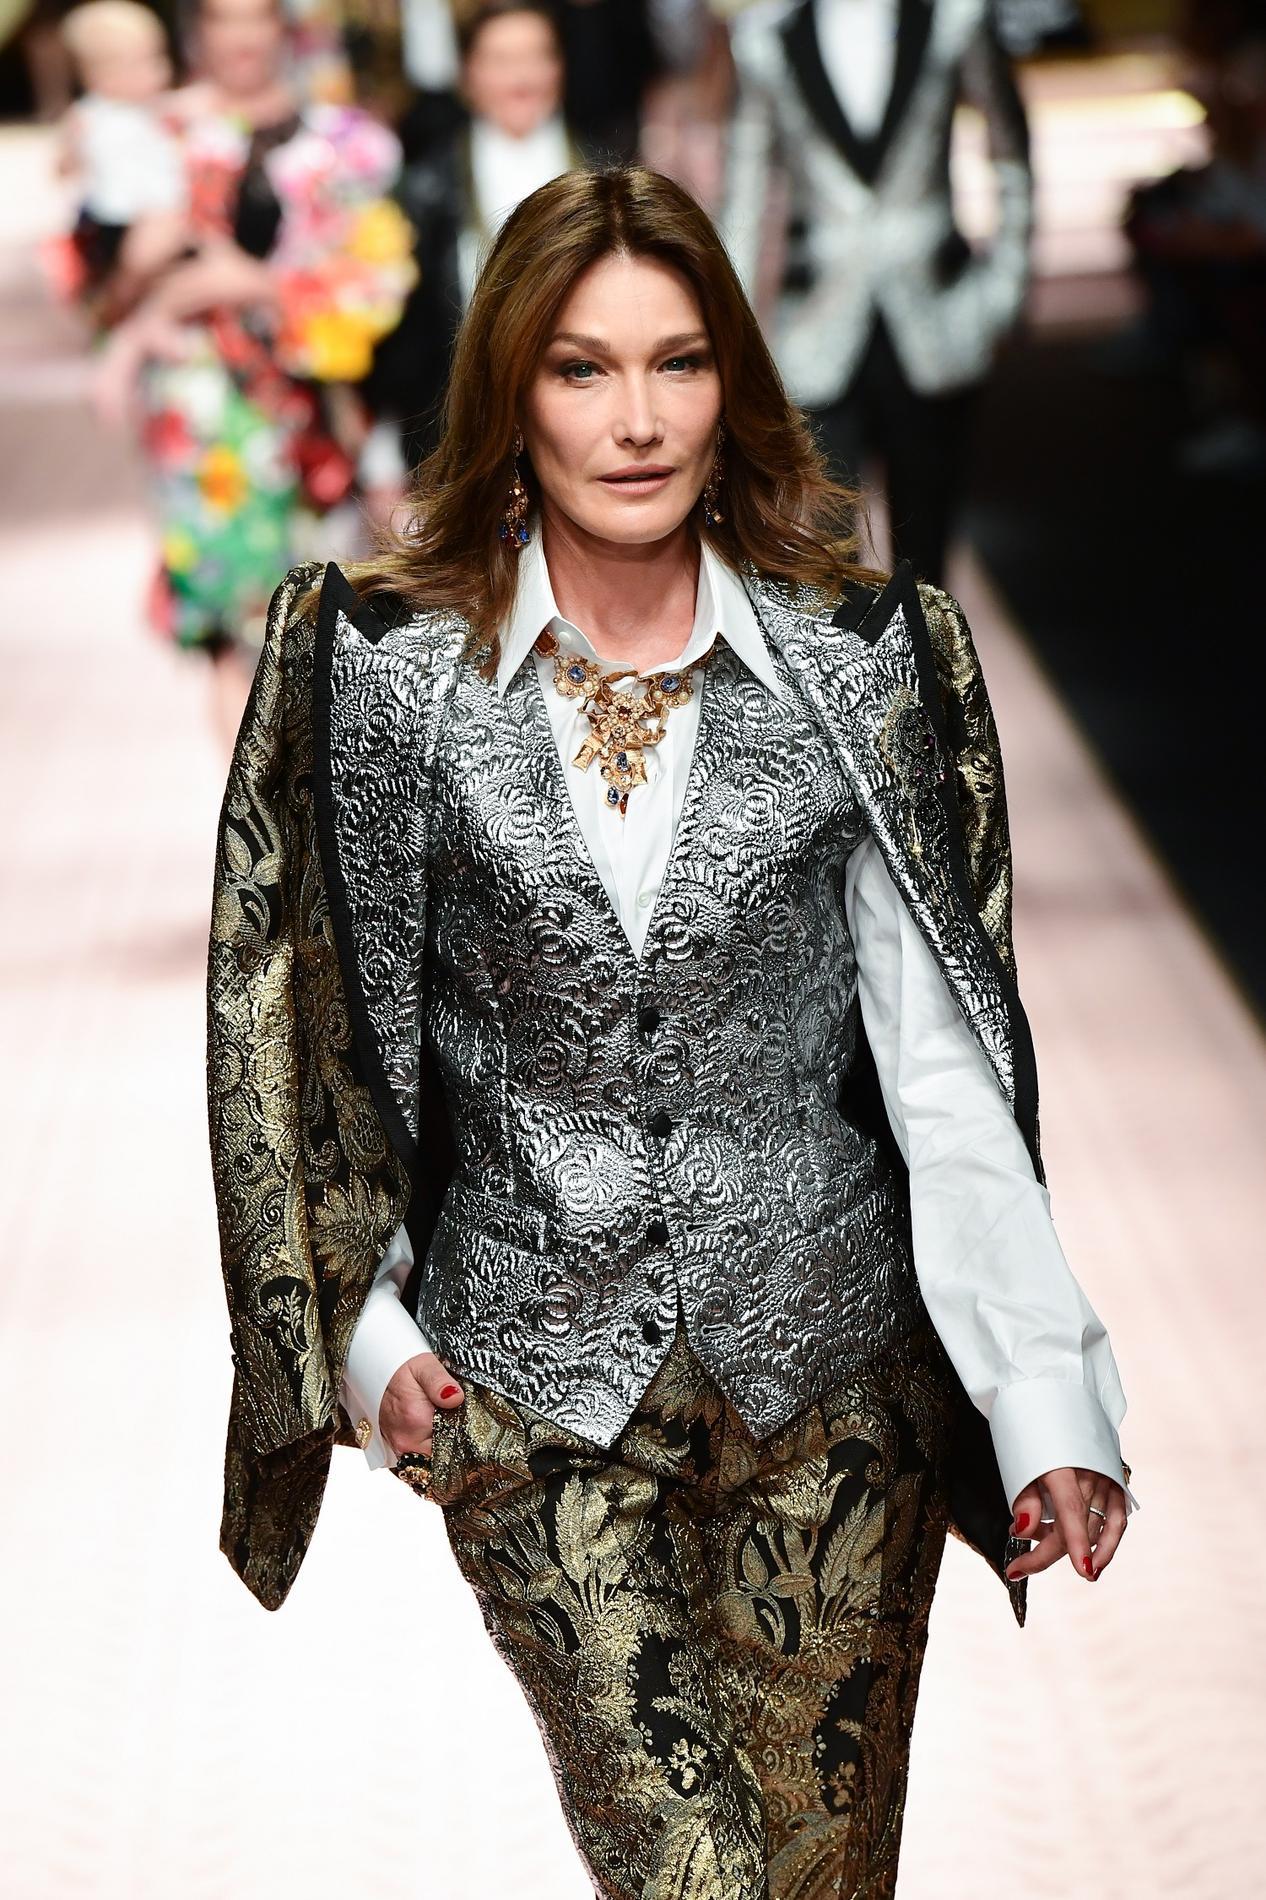 aa46aae5ef4 Carla Bruni défile pour Dolce   Gabbana à Milan. (Milan